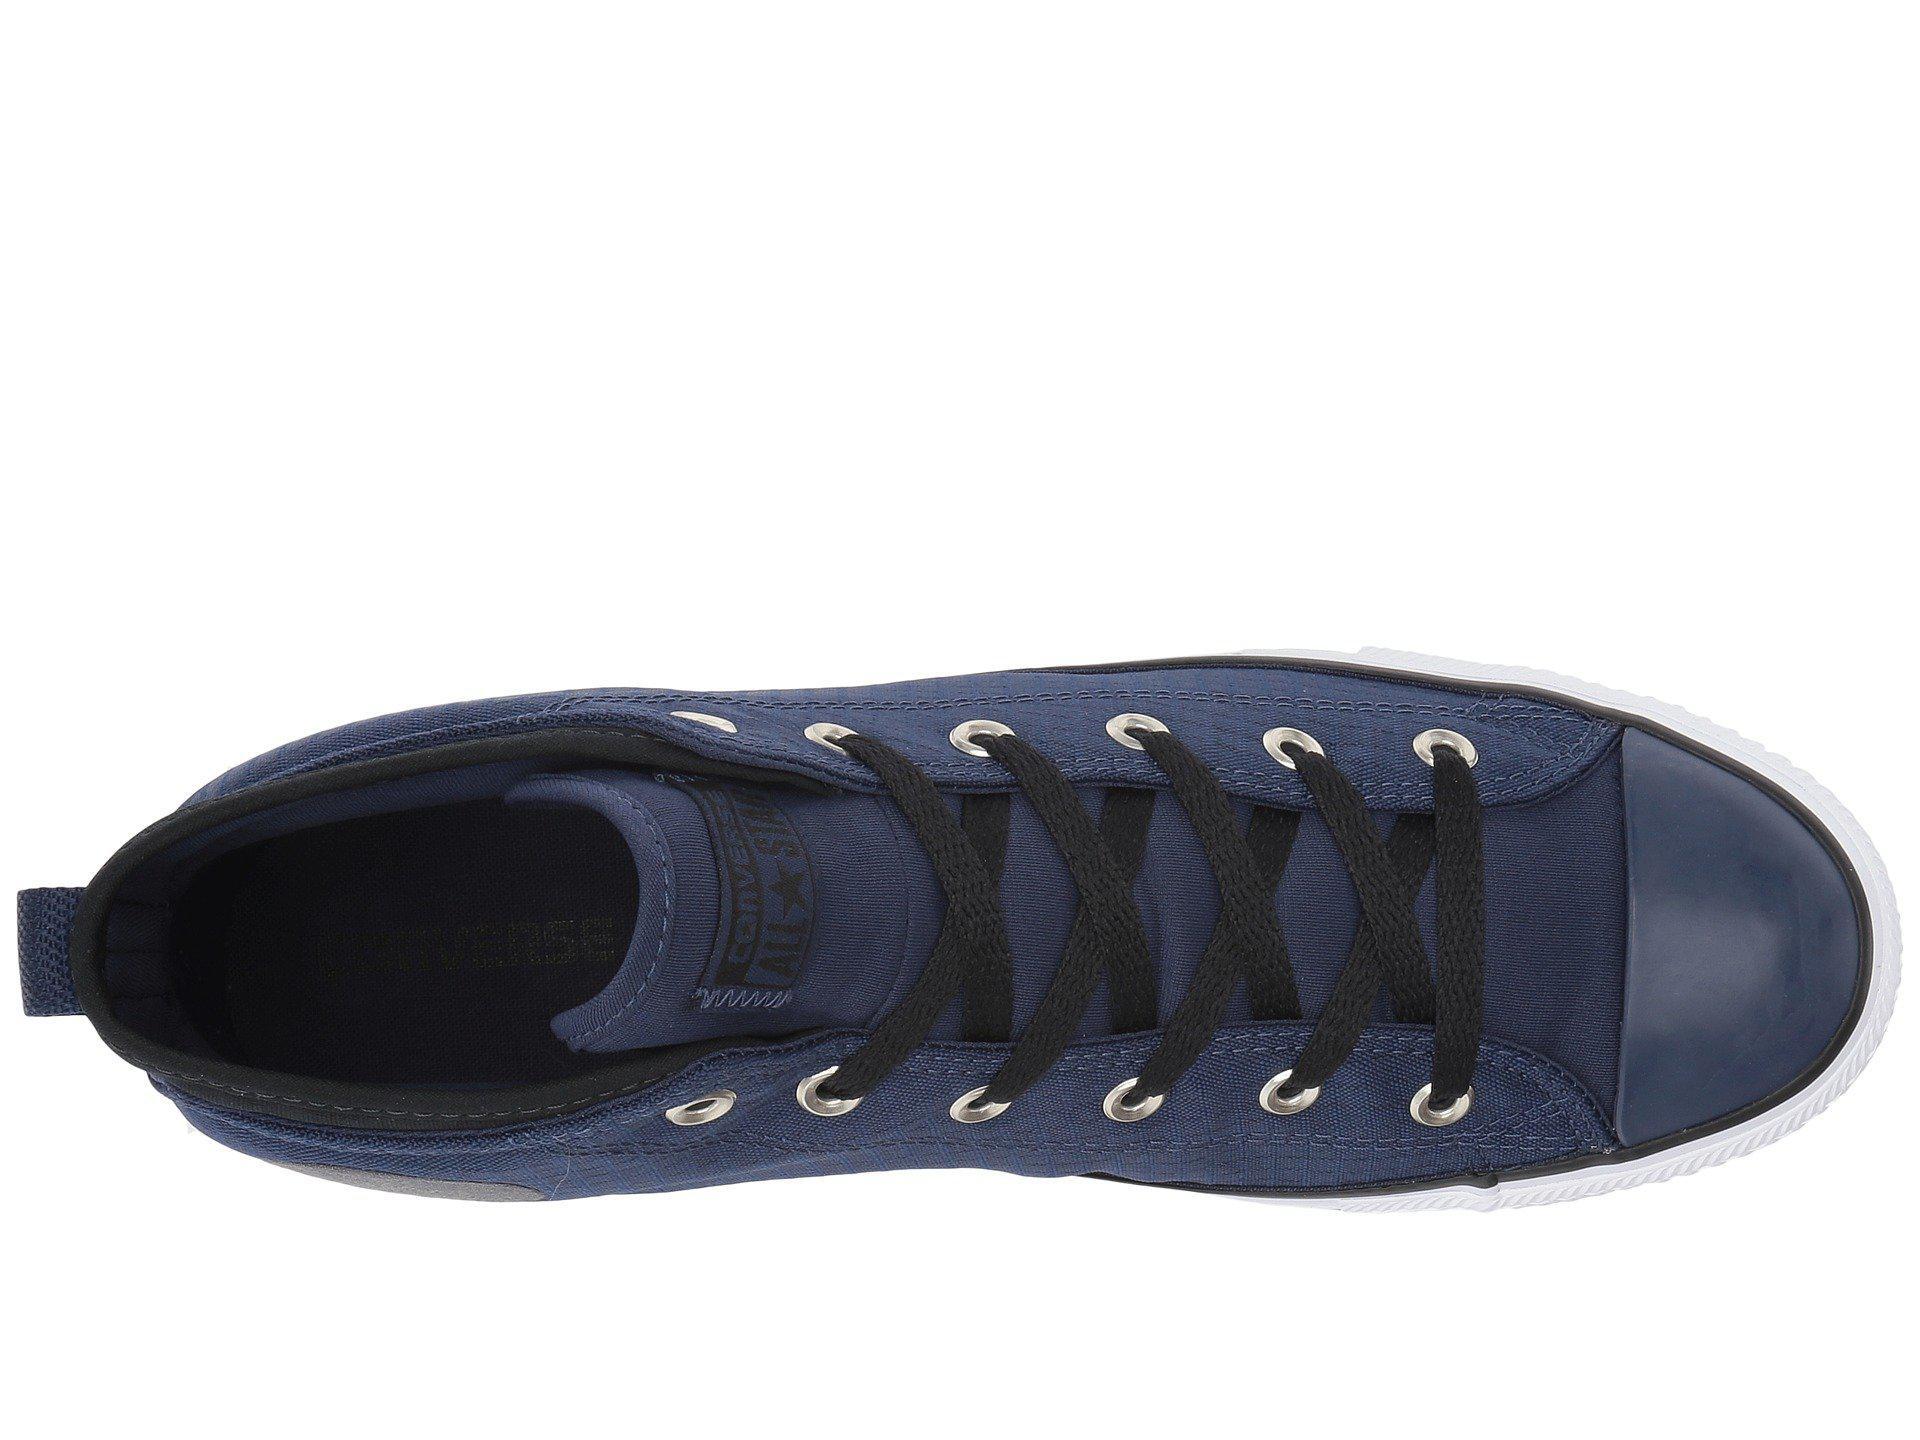 Converse - Blue Chuck Taylor® All Star® Syde Street - Mid - Lyst. View  fullscreen d5d11c0e2